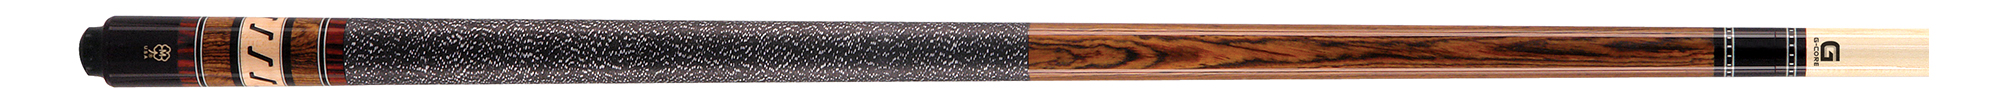 PK3027: McDermott G308 Bocote/inlay pool Gewicht: 19Oz #1